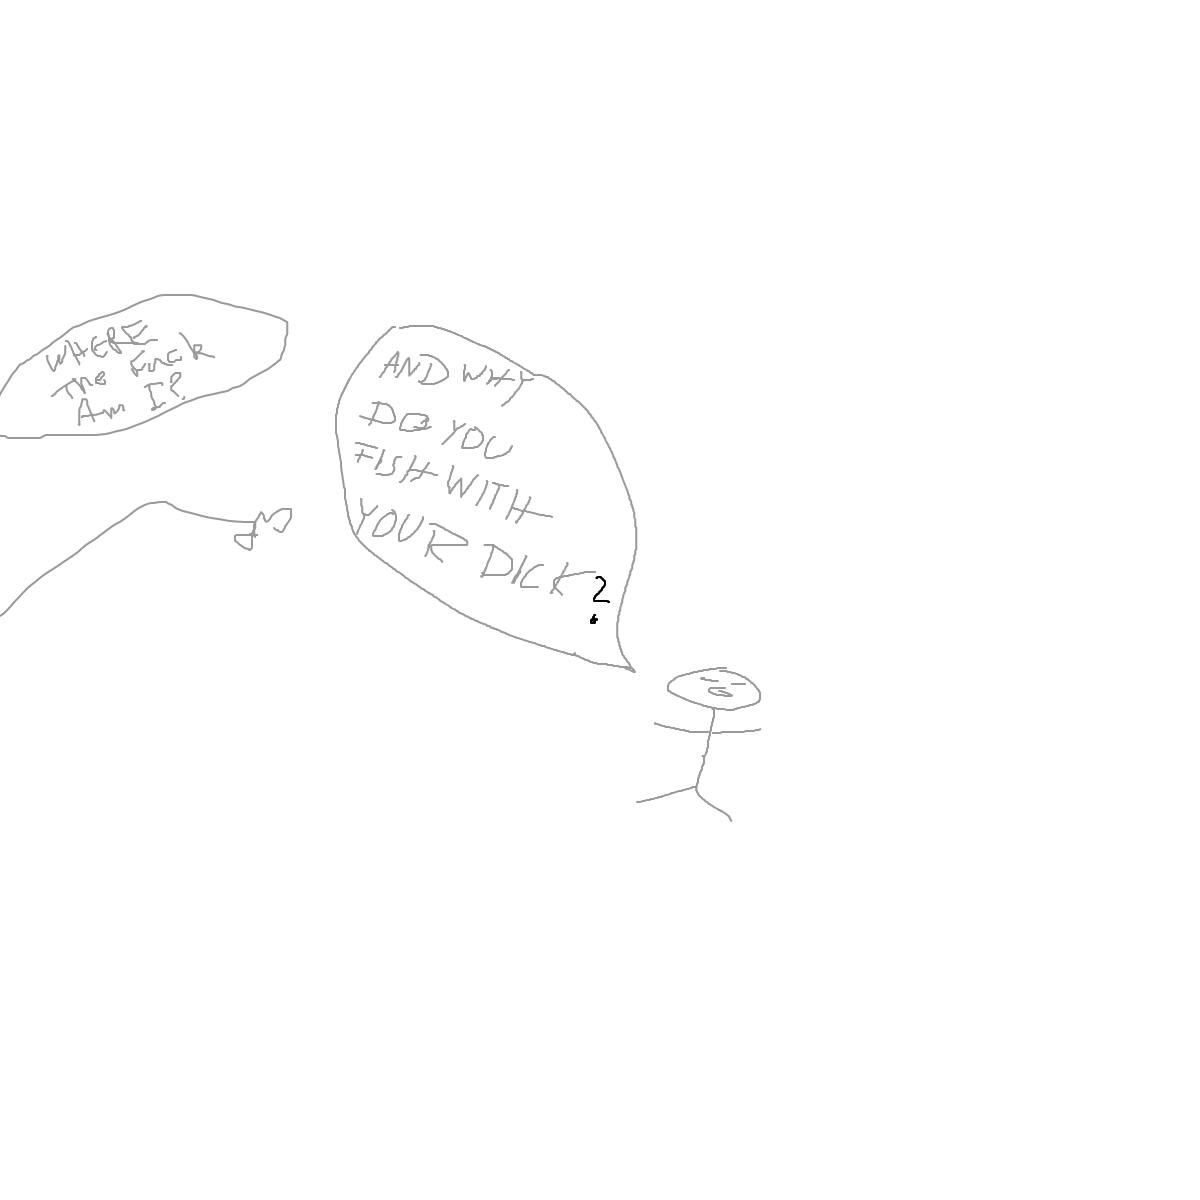 BAAAM drawing#336 lat:-49.3449211120605500lng: 69.3469314575195300